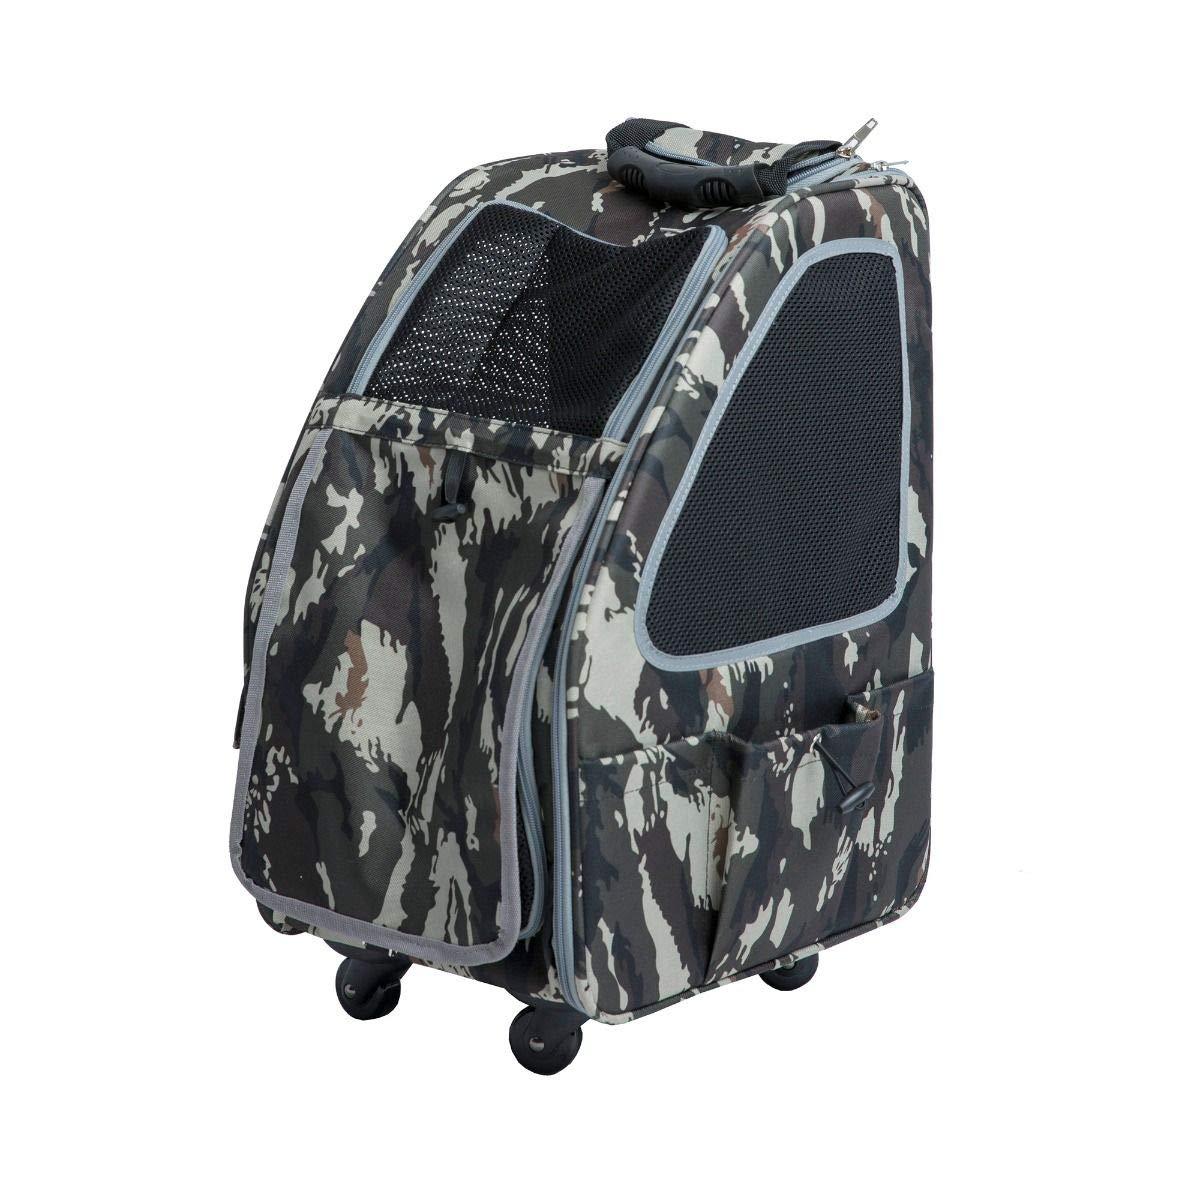 PETIQUE PC01020103 Pet Stroller, Army Camo, One Size